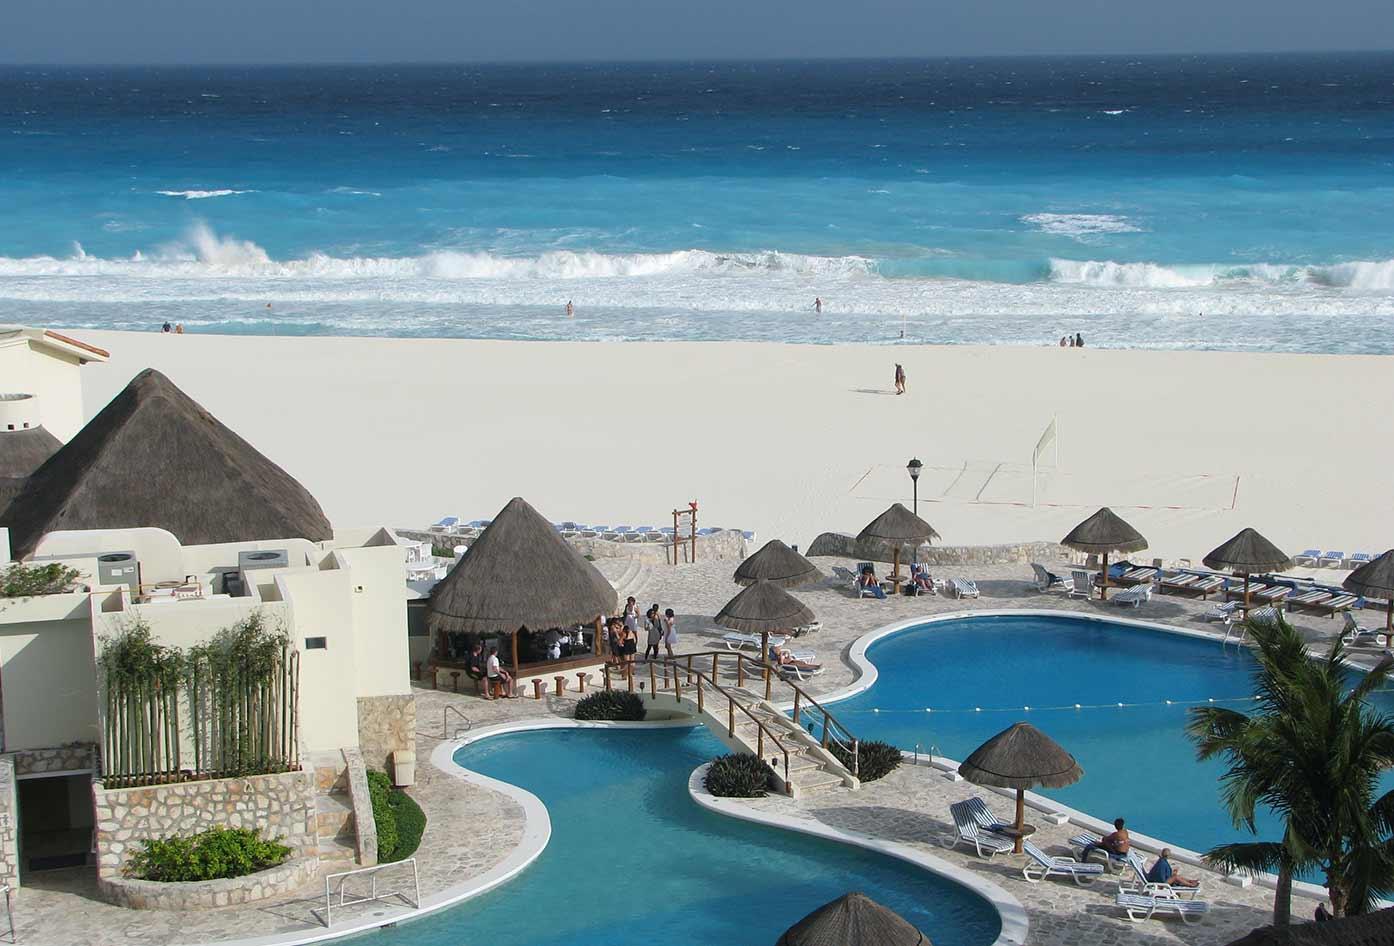 cancun resort mexico